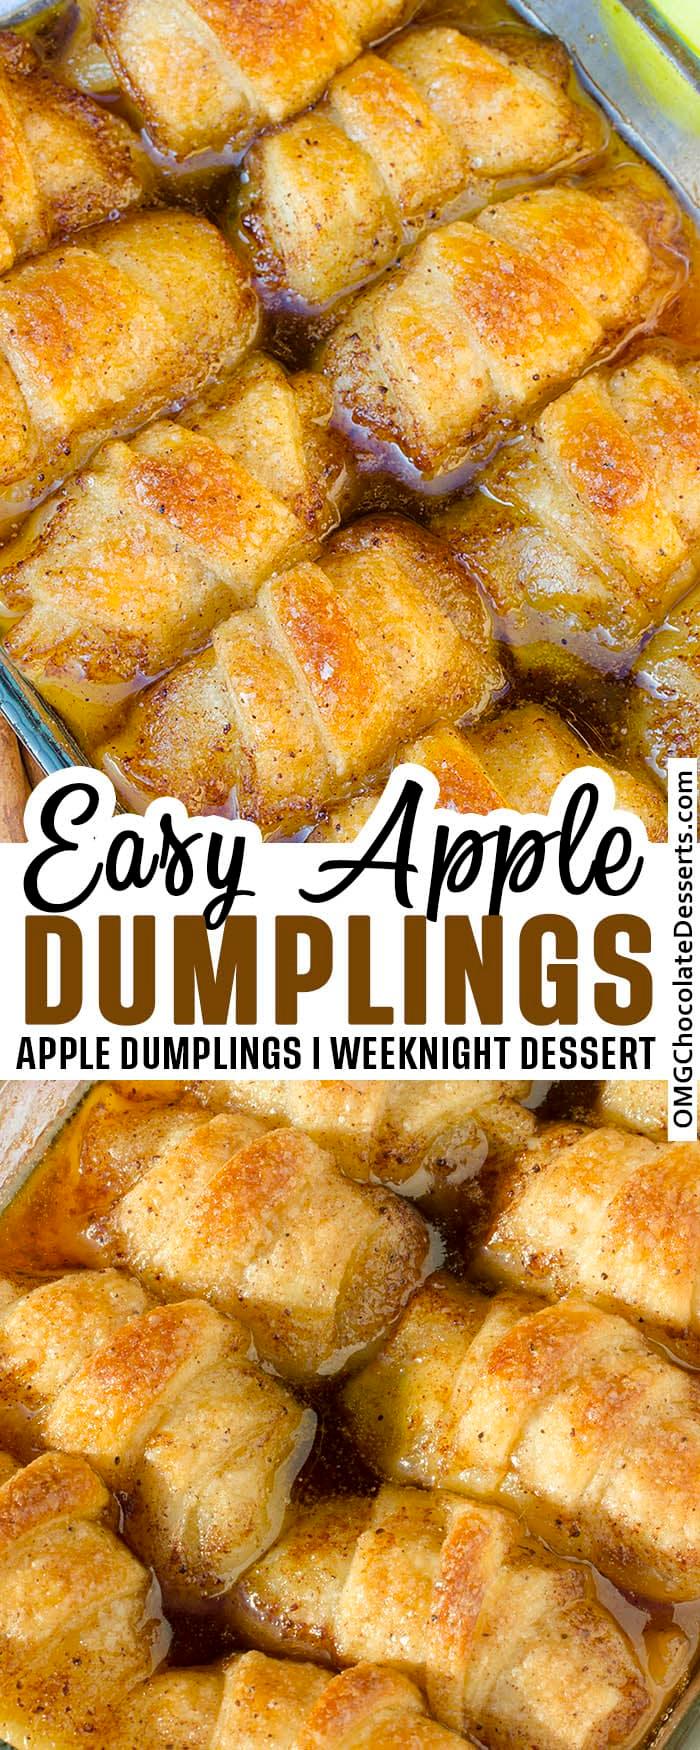 easy apple dumplings in 2020 easy apple dumplings apple dumplings apple dessert recipes pinterest